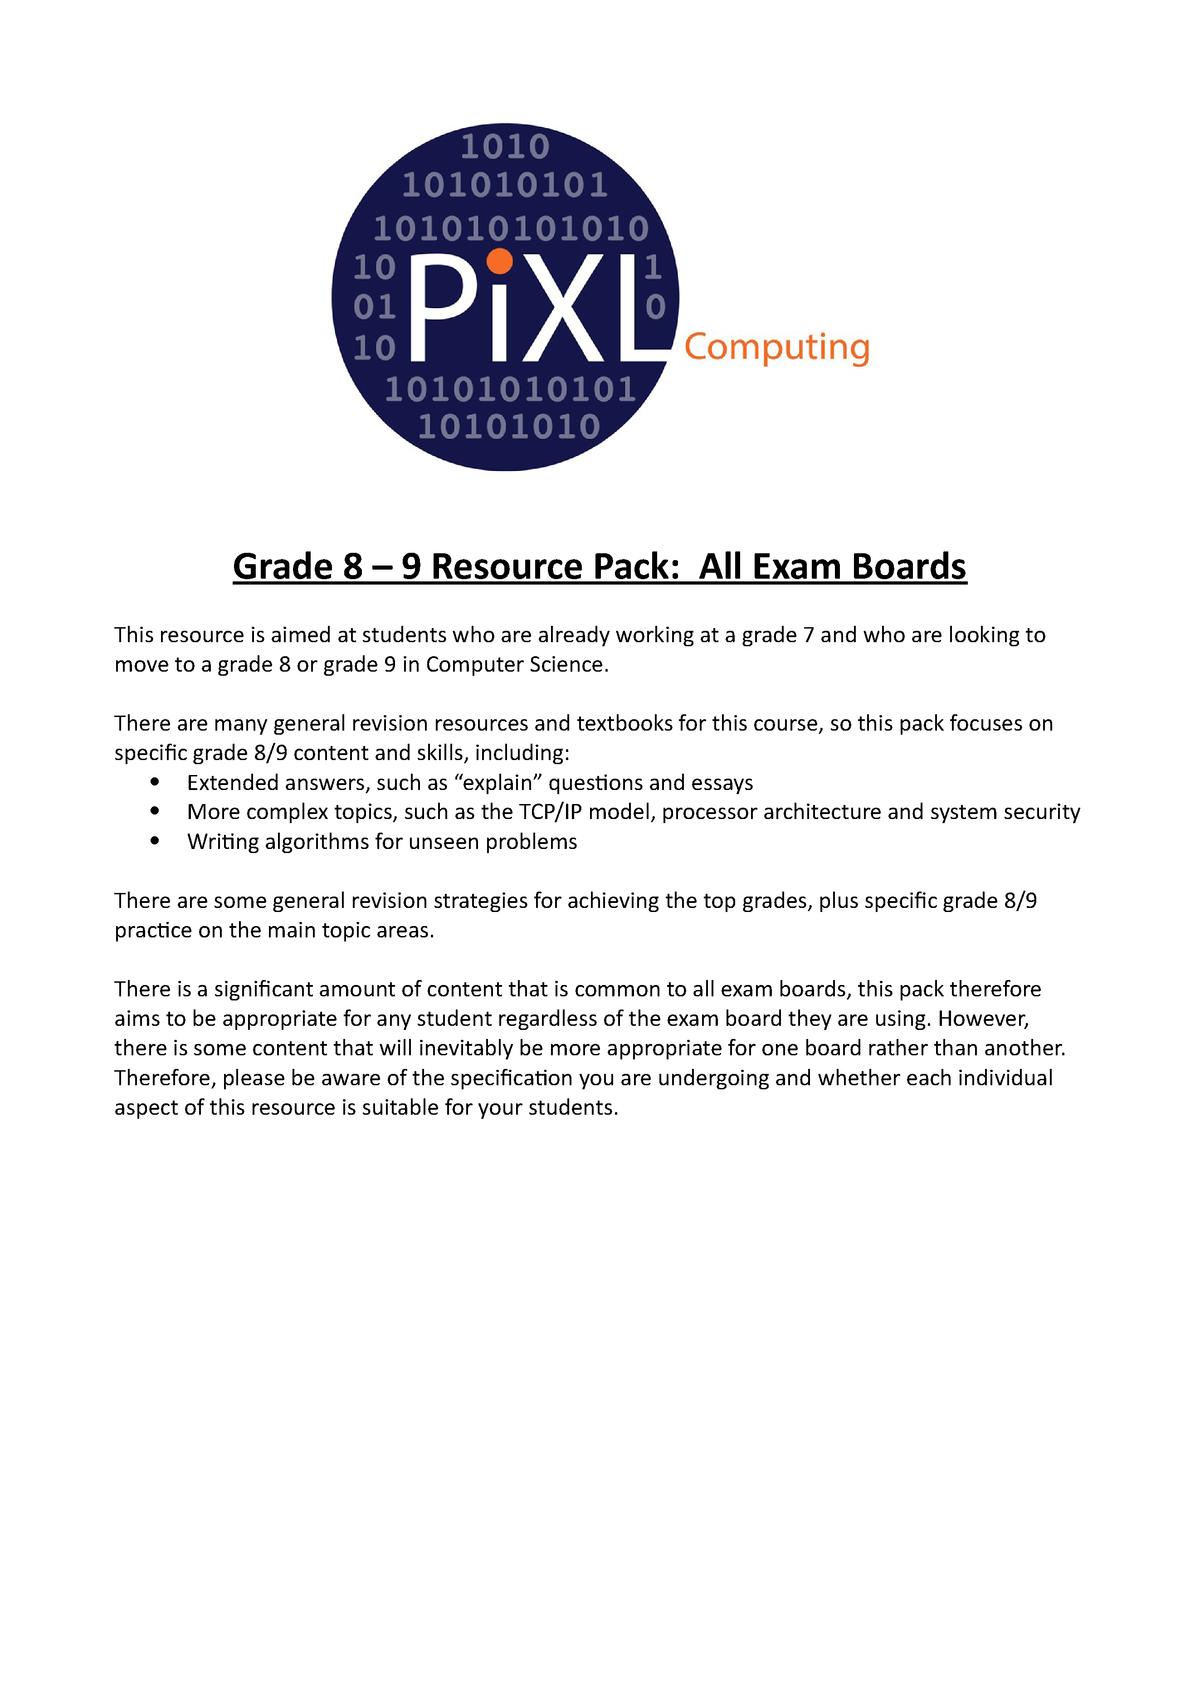 Computer Science summary pack - CS1S466 - StuDocu